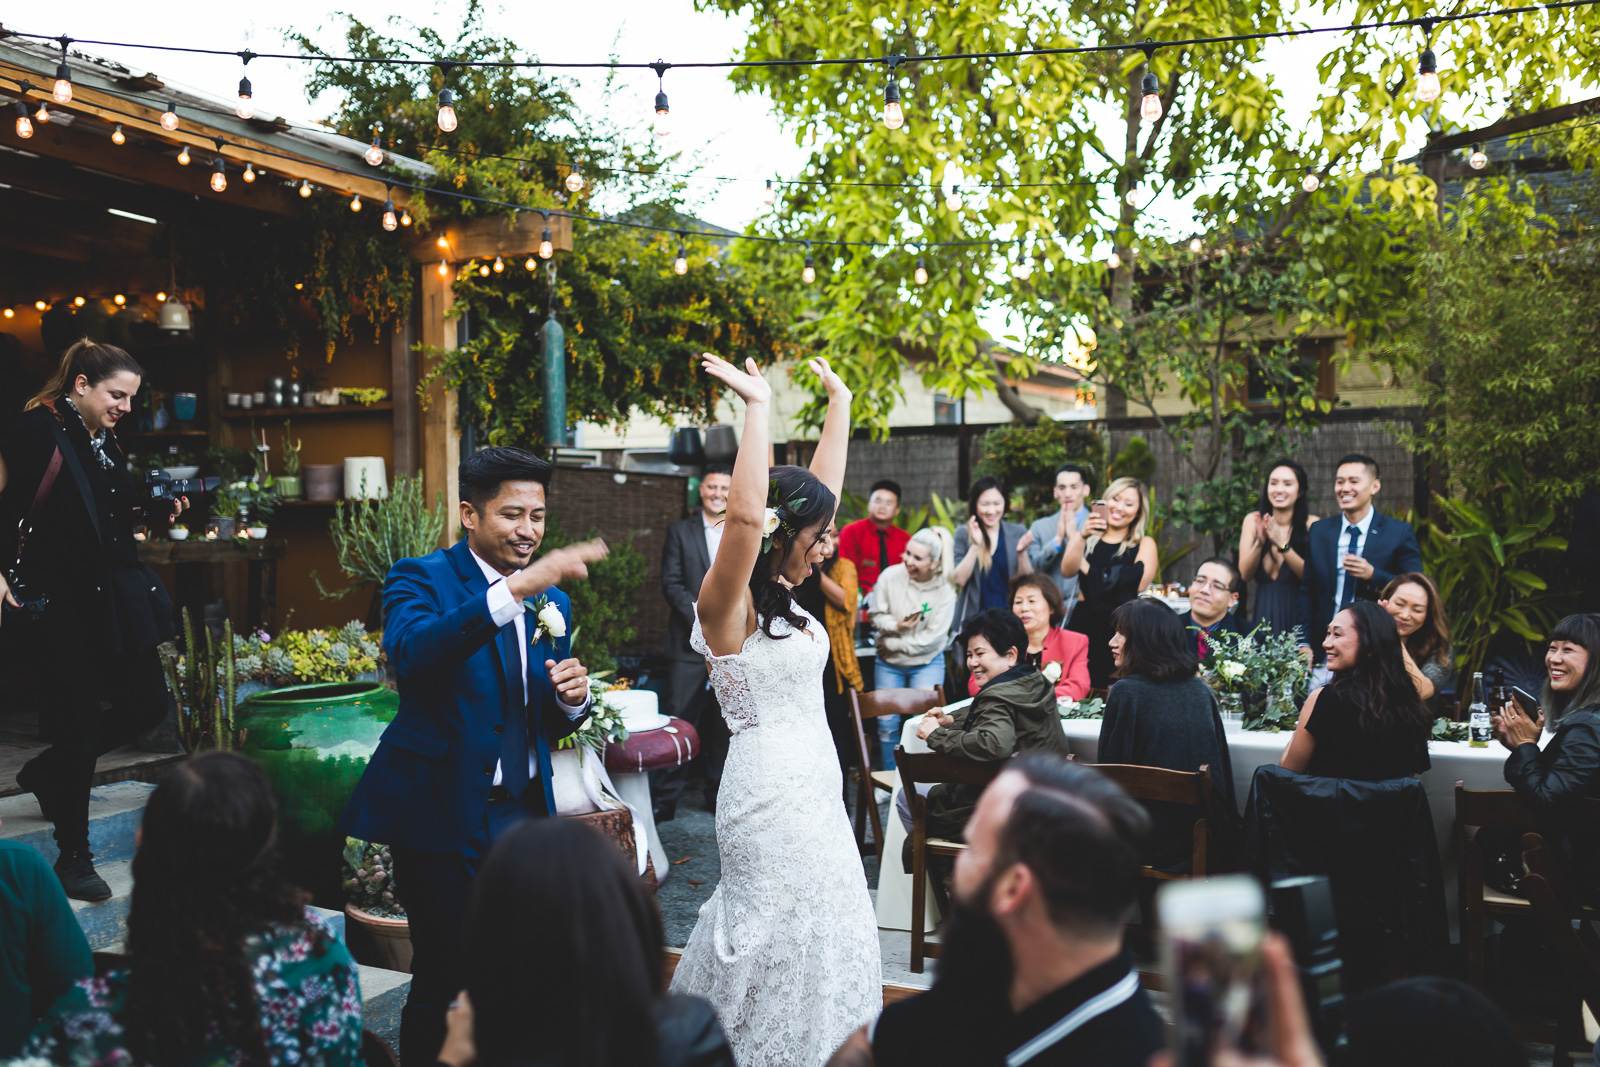 Jeremy-Lizette-Wedding-9.jpg